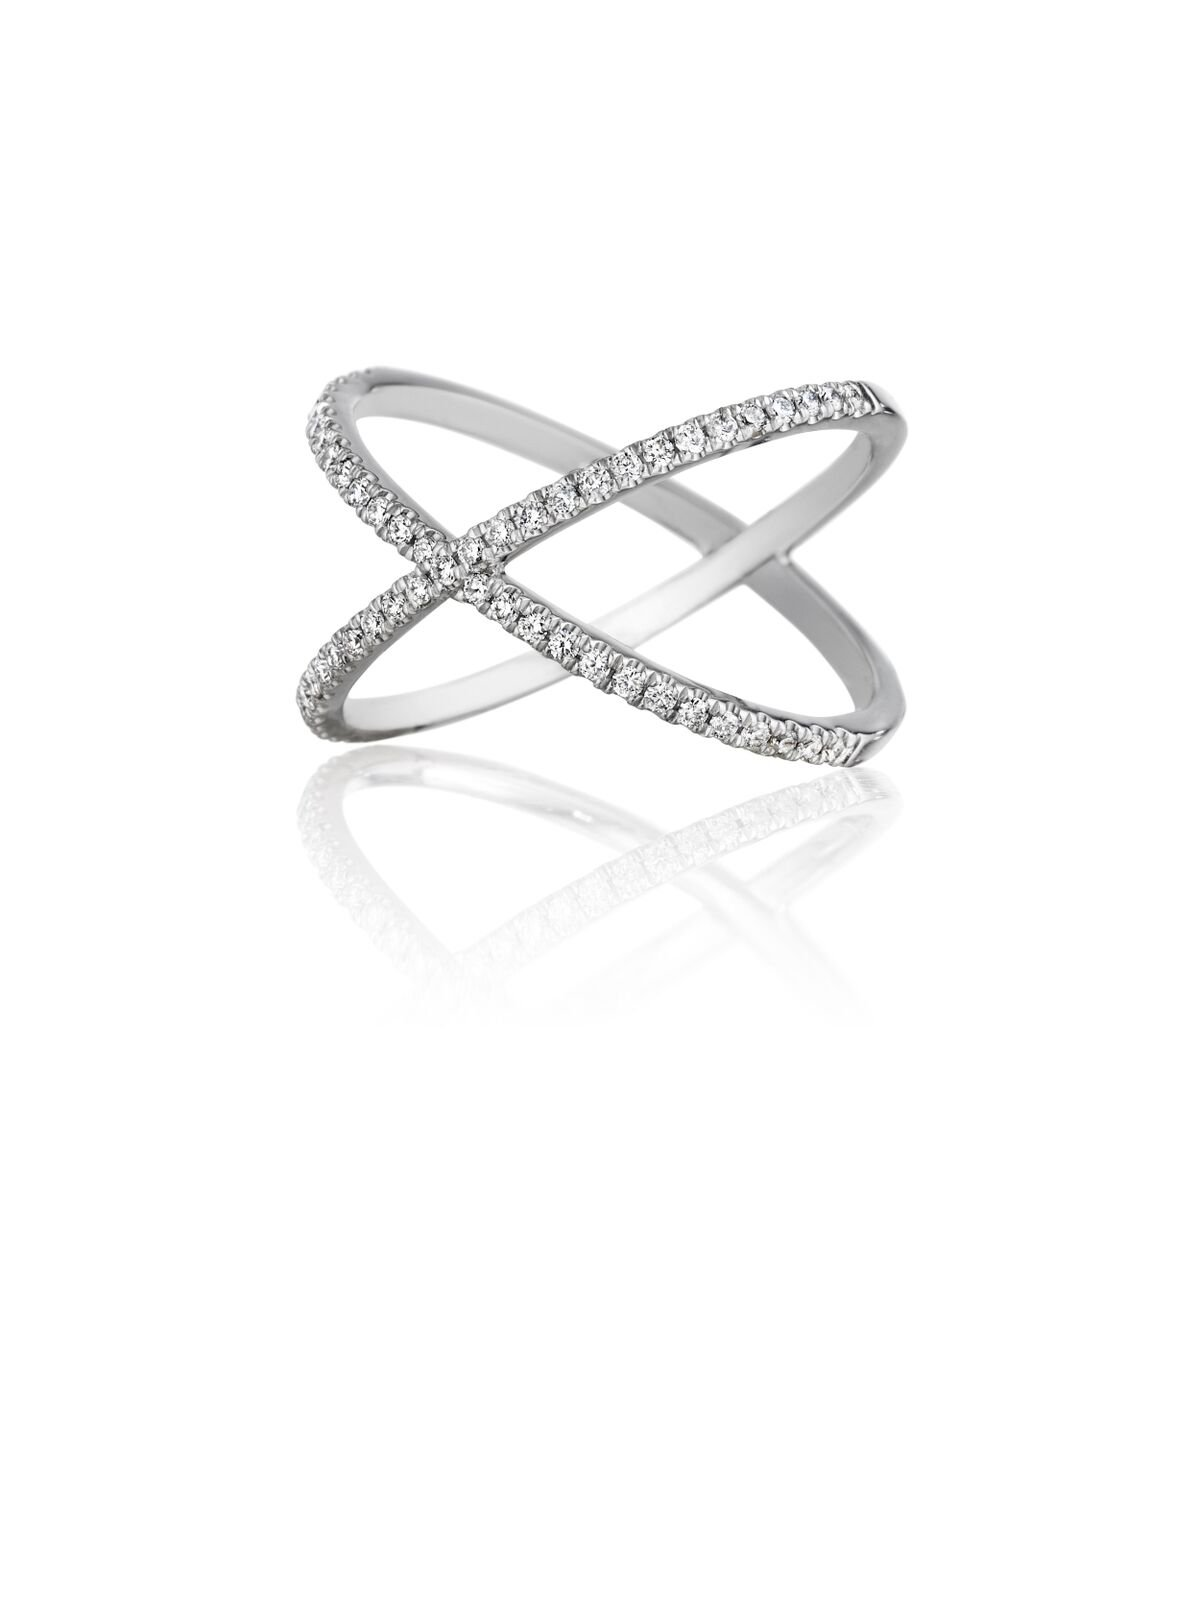 Criss-Cross Diamond Band